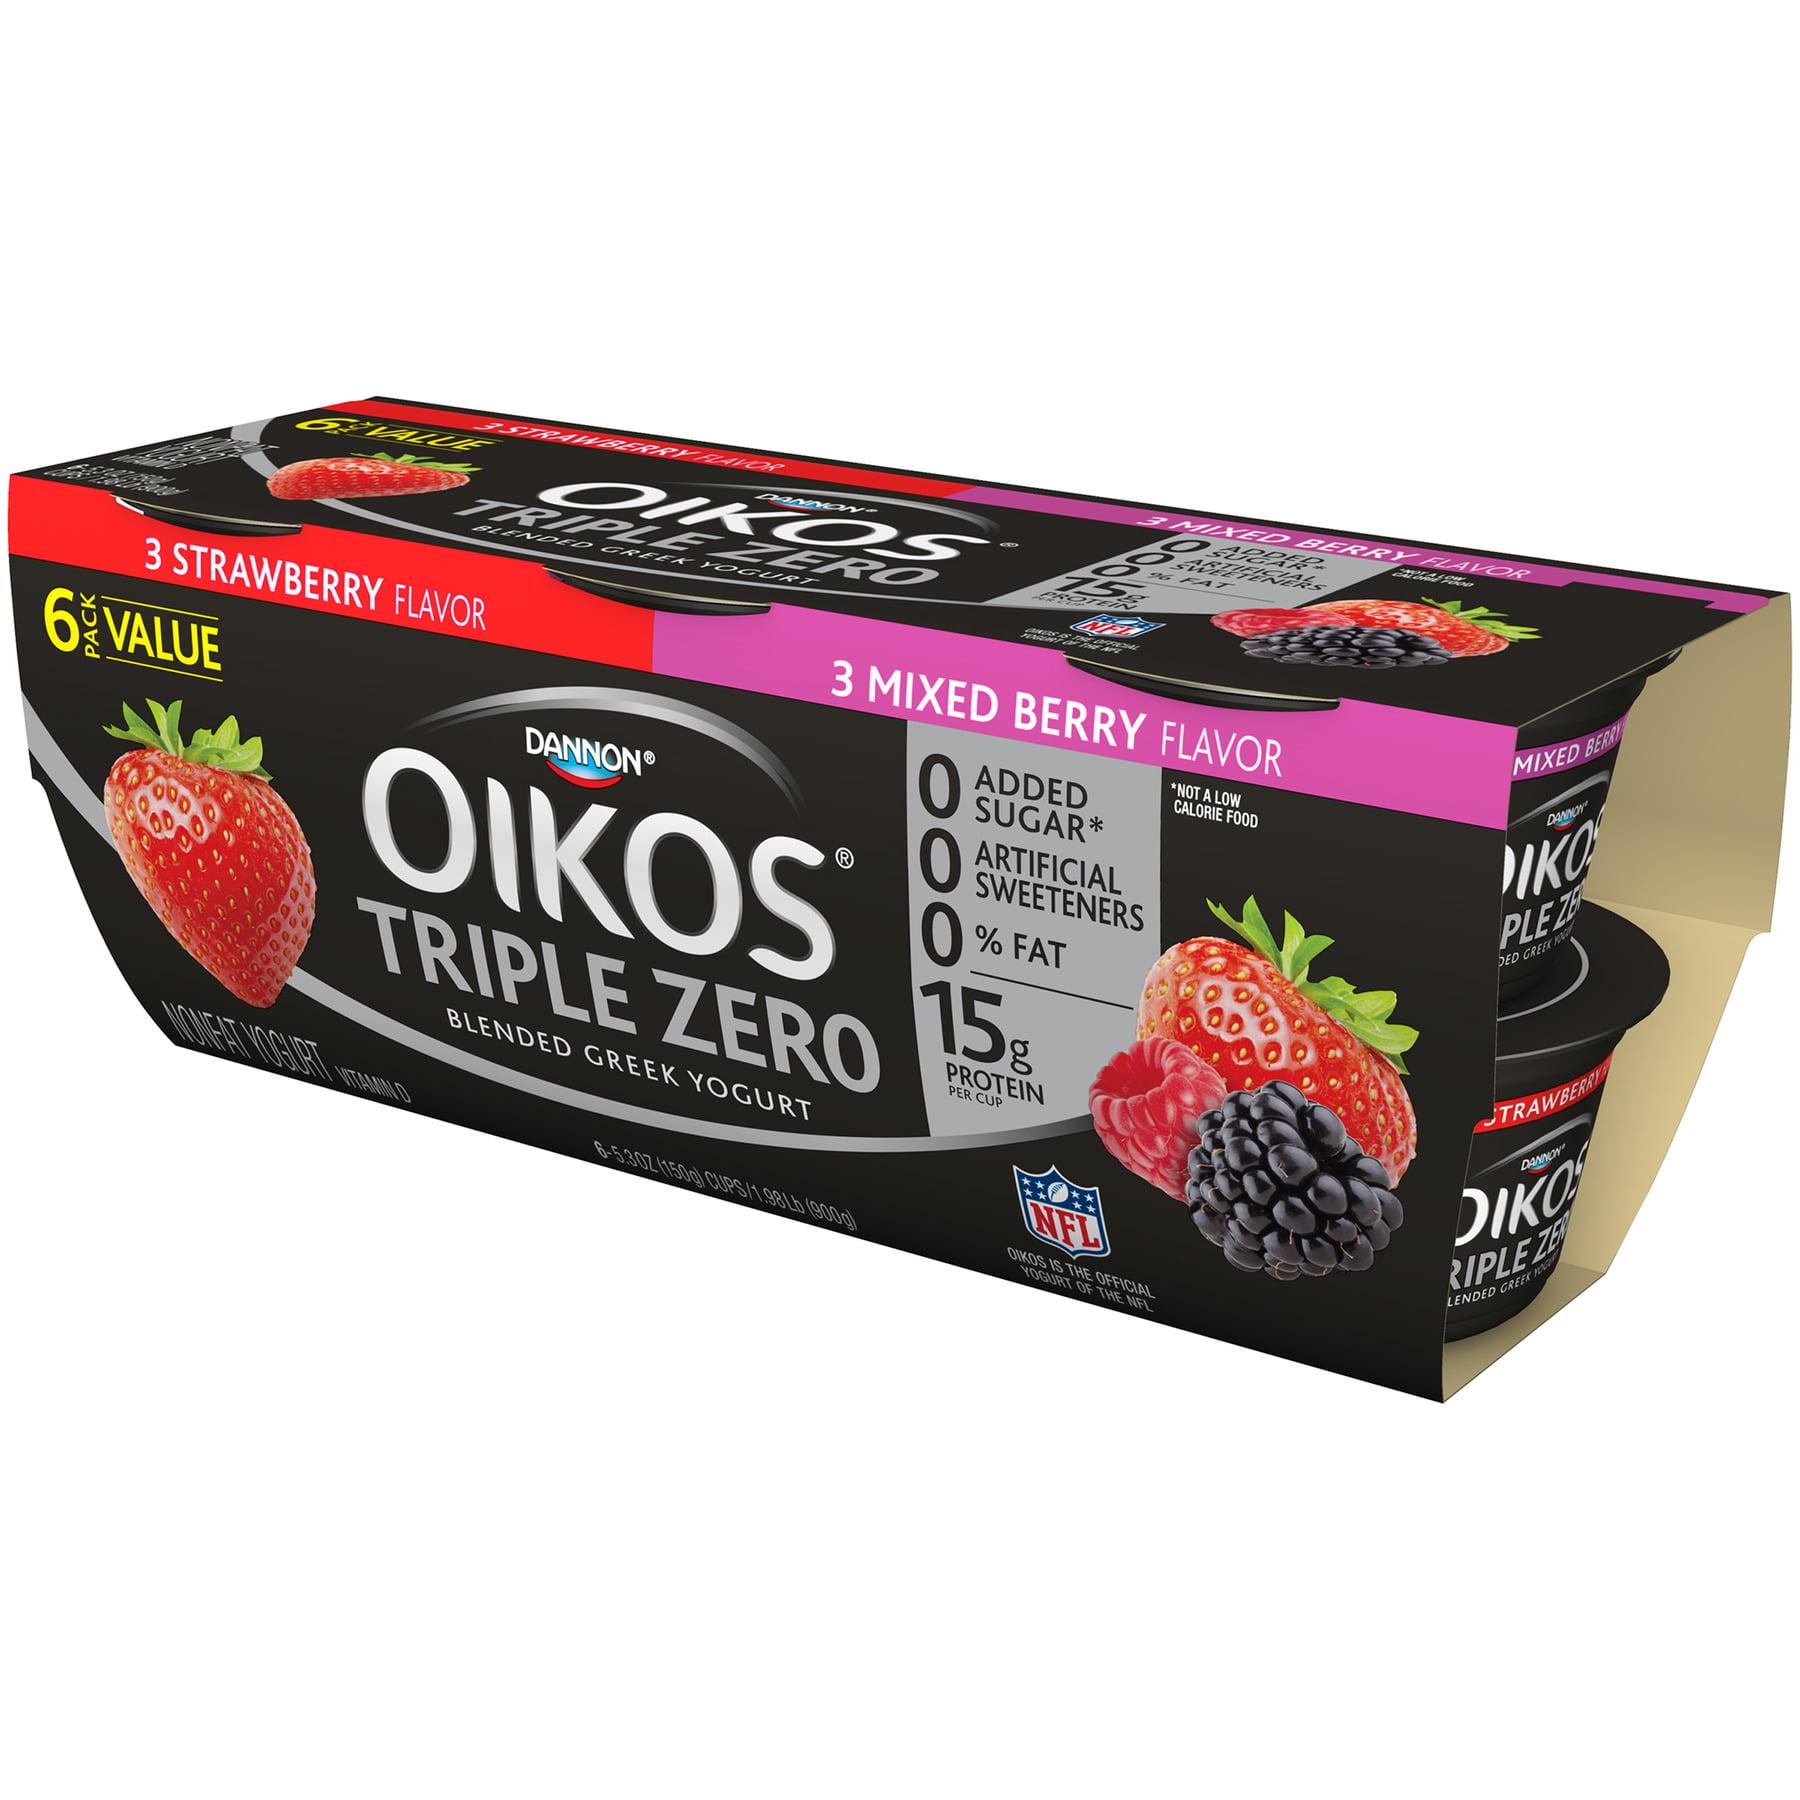 Oikos, Triple Zero Strawberry/Mixed Berry Greek Nonfat Yogurt, 5.3 Oz., 6 Count